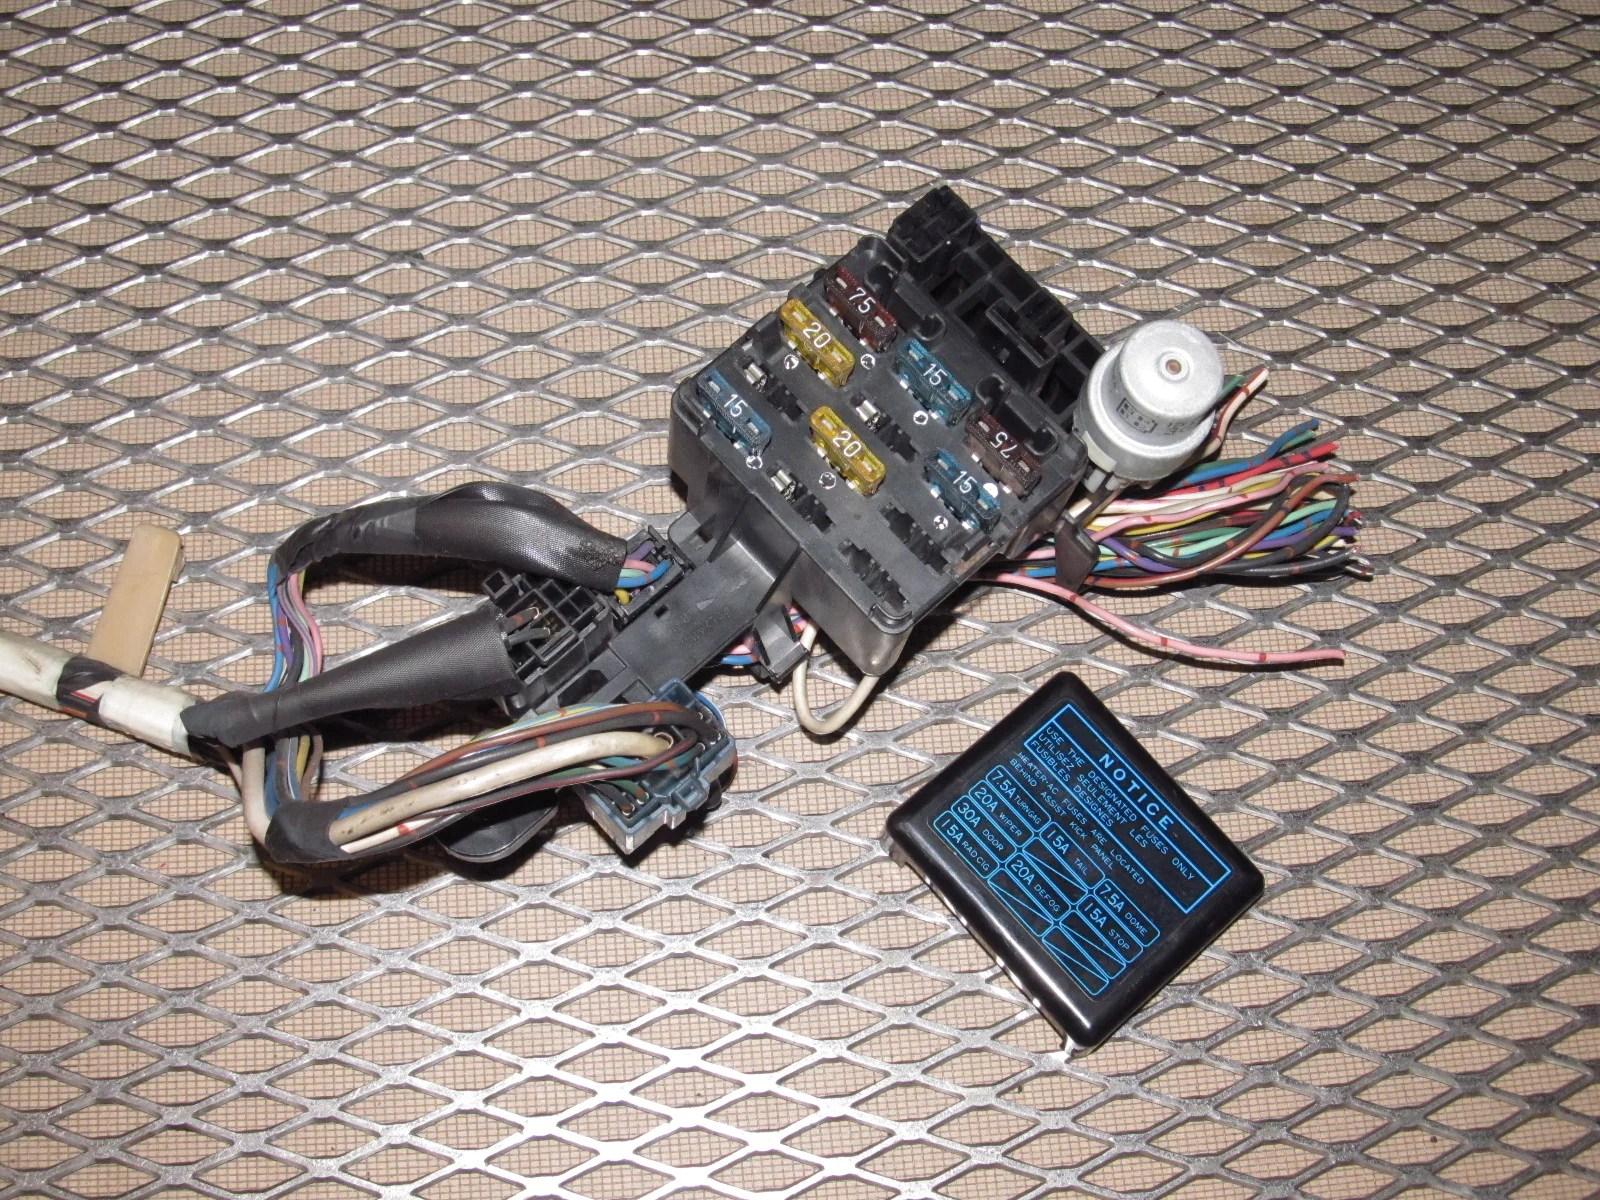 90 96 300zx interior fuse box relay panel dash wiring diagram host 90 96 300zx interior fuse box relay panel dash [ 1600 x 1200 Pixel ]